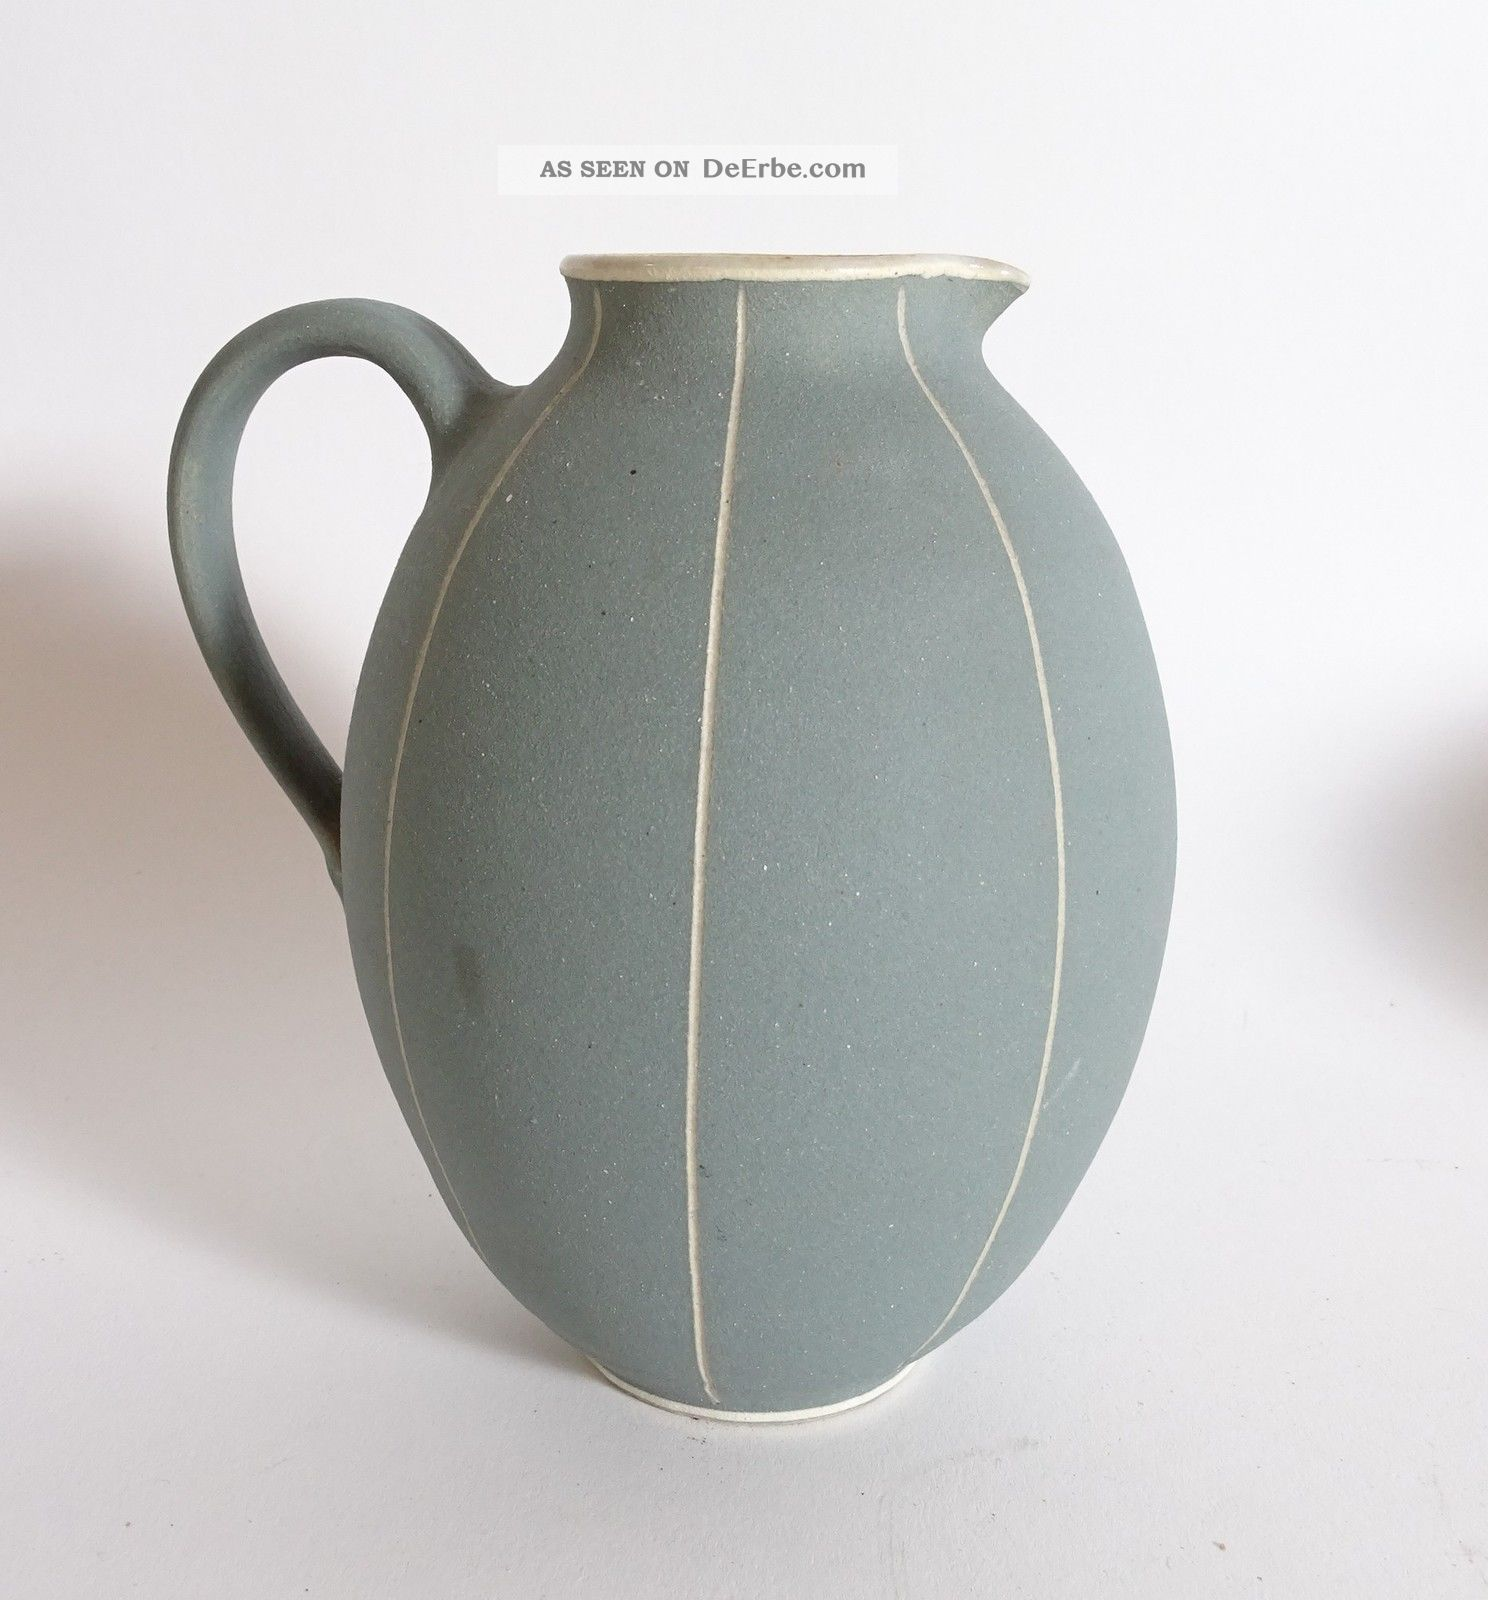 Studio Design 50er Jahre Mid Century Keramik Vase Henkel Hellblau Tolles Design 1950-1959 Bild